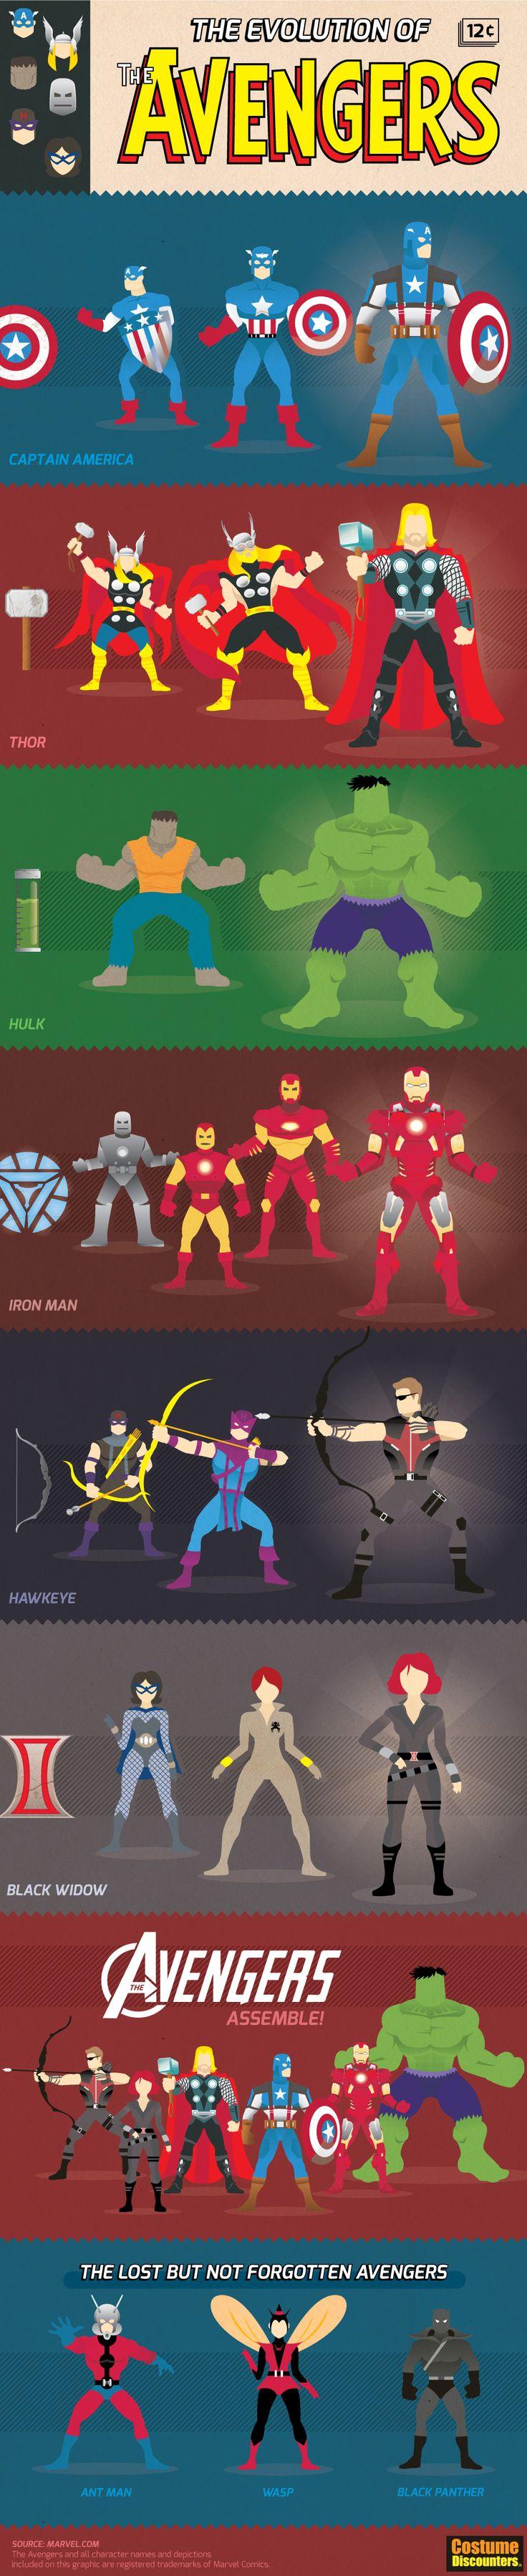 The Evolution Of The Avengers Infographic * Captain America * Thor * Hulk * Iron Man * Hawkeye * Black Widow *